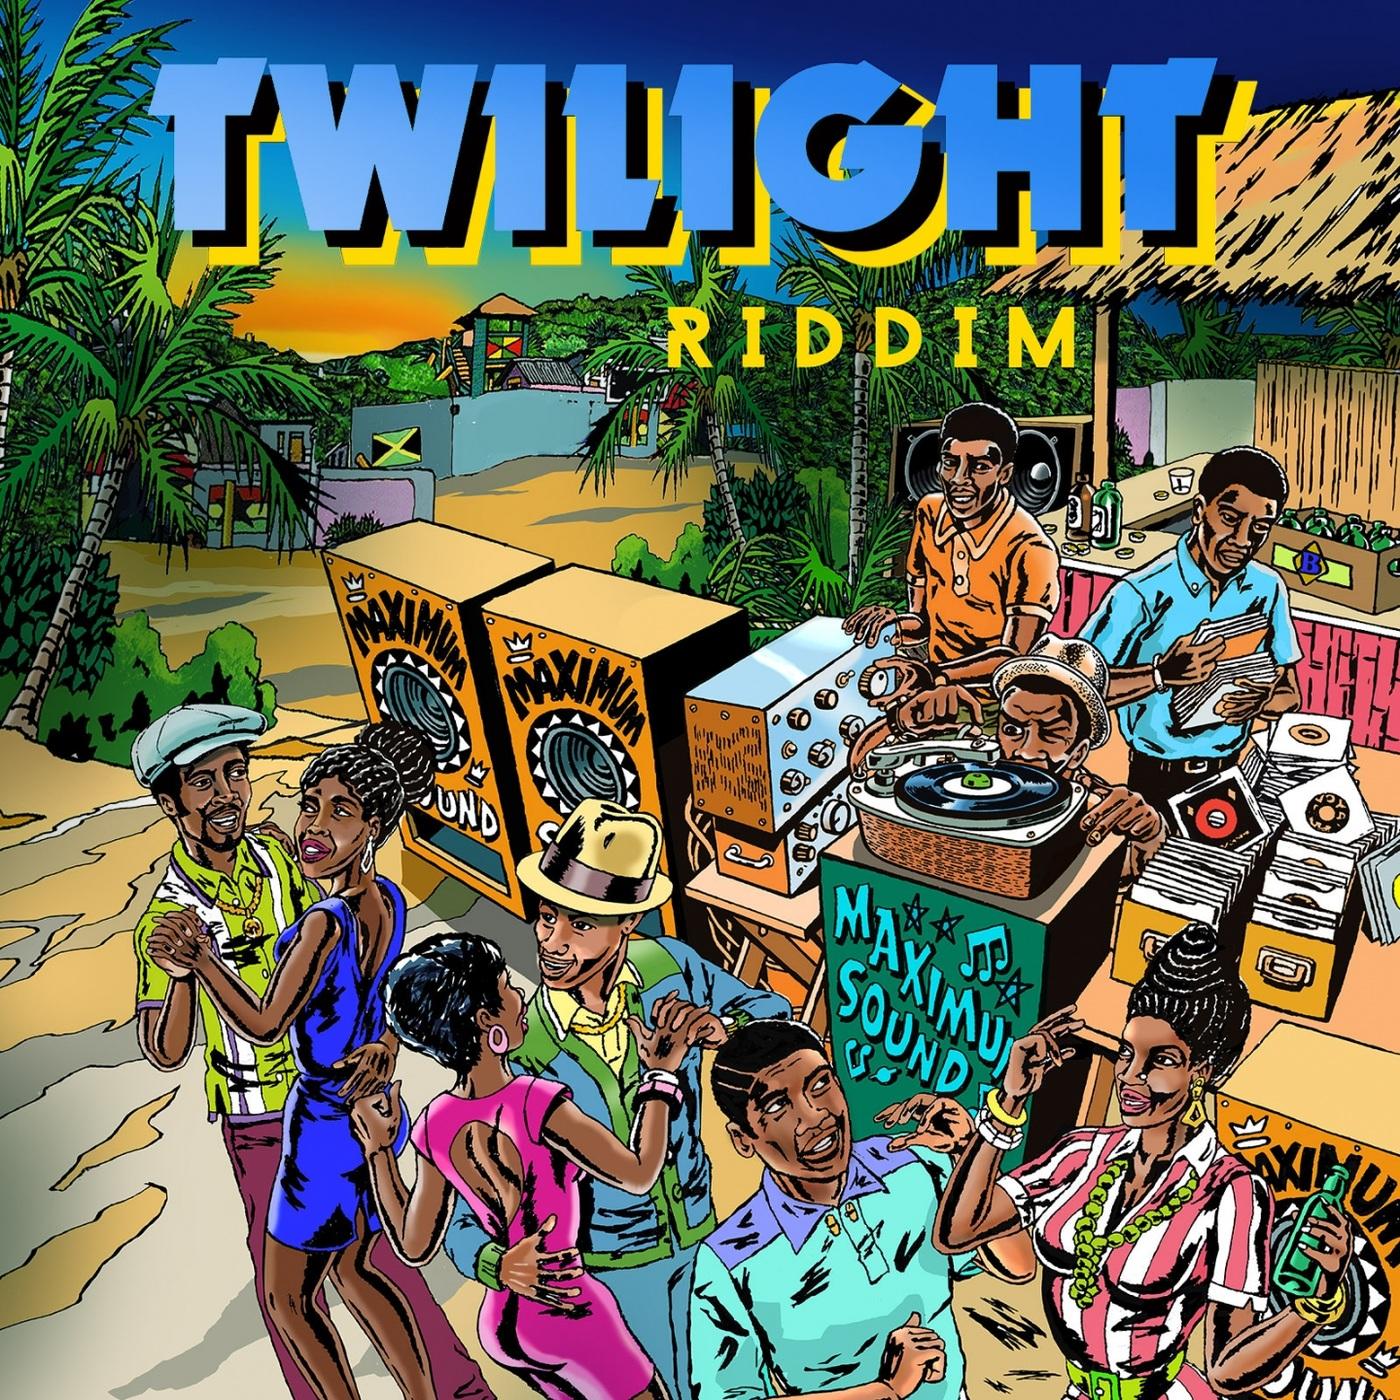 Twilight Riddim [Maximum Sound] 2018 - Rasta Reggae Sounds